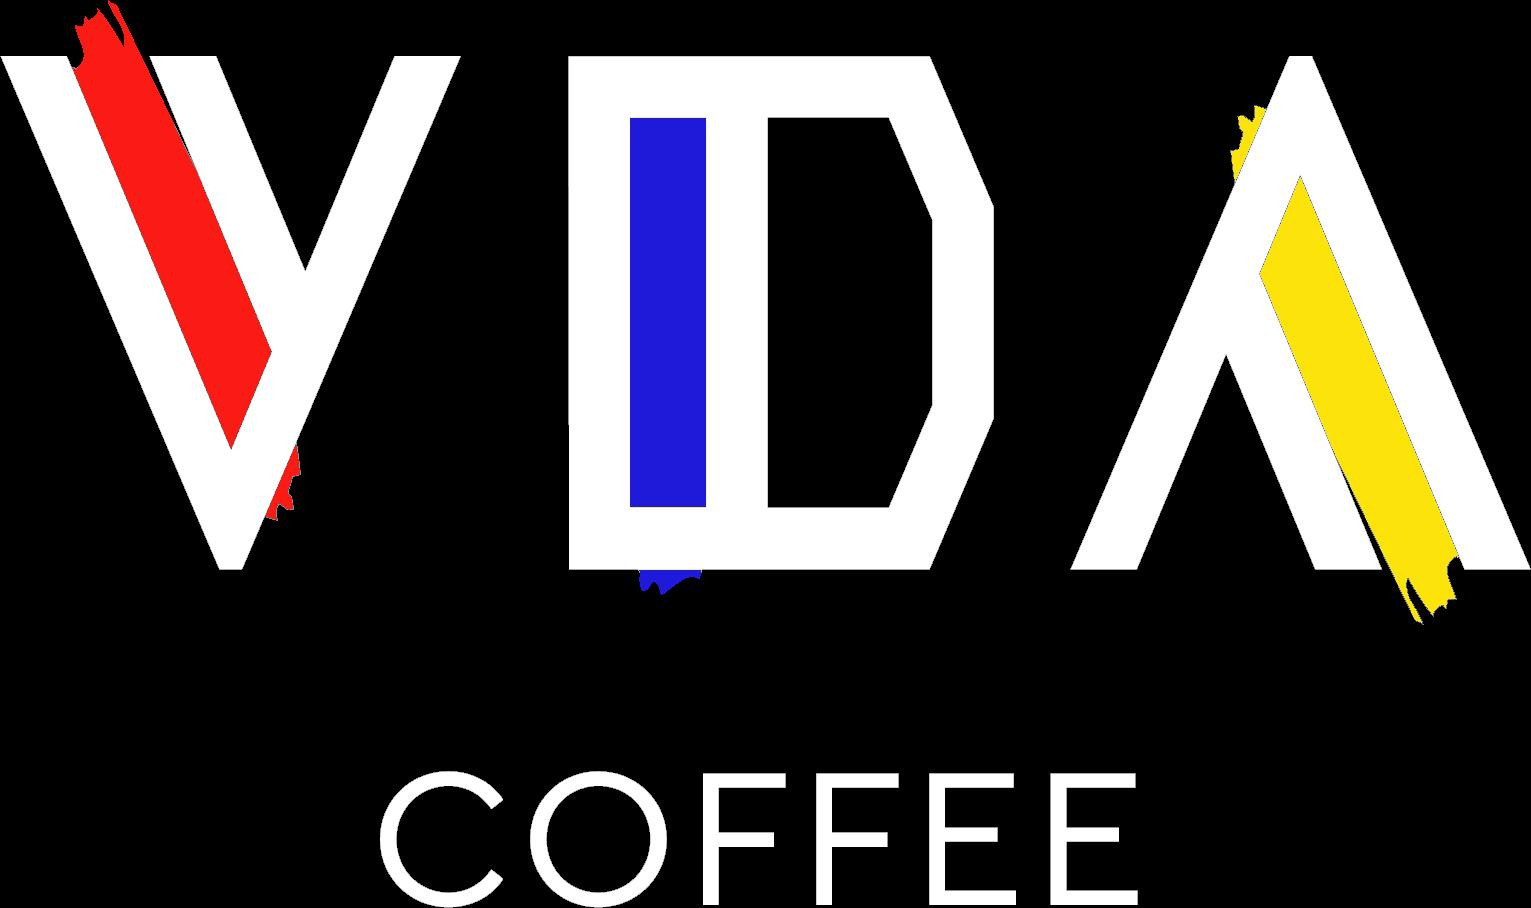 VDA Coffee